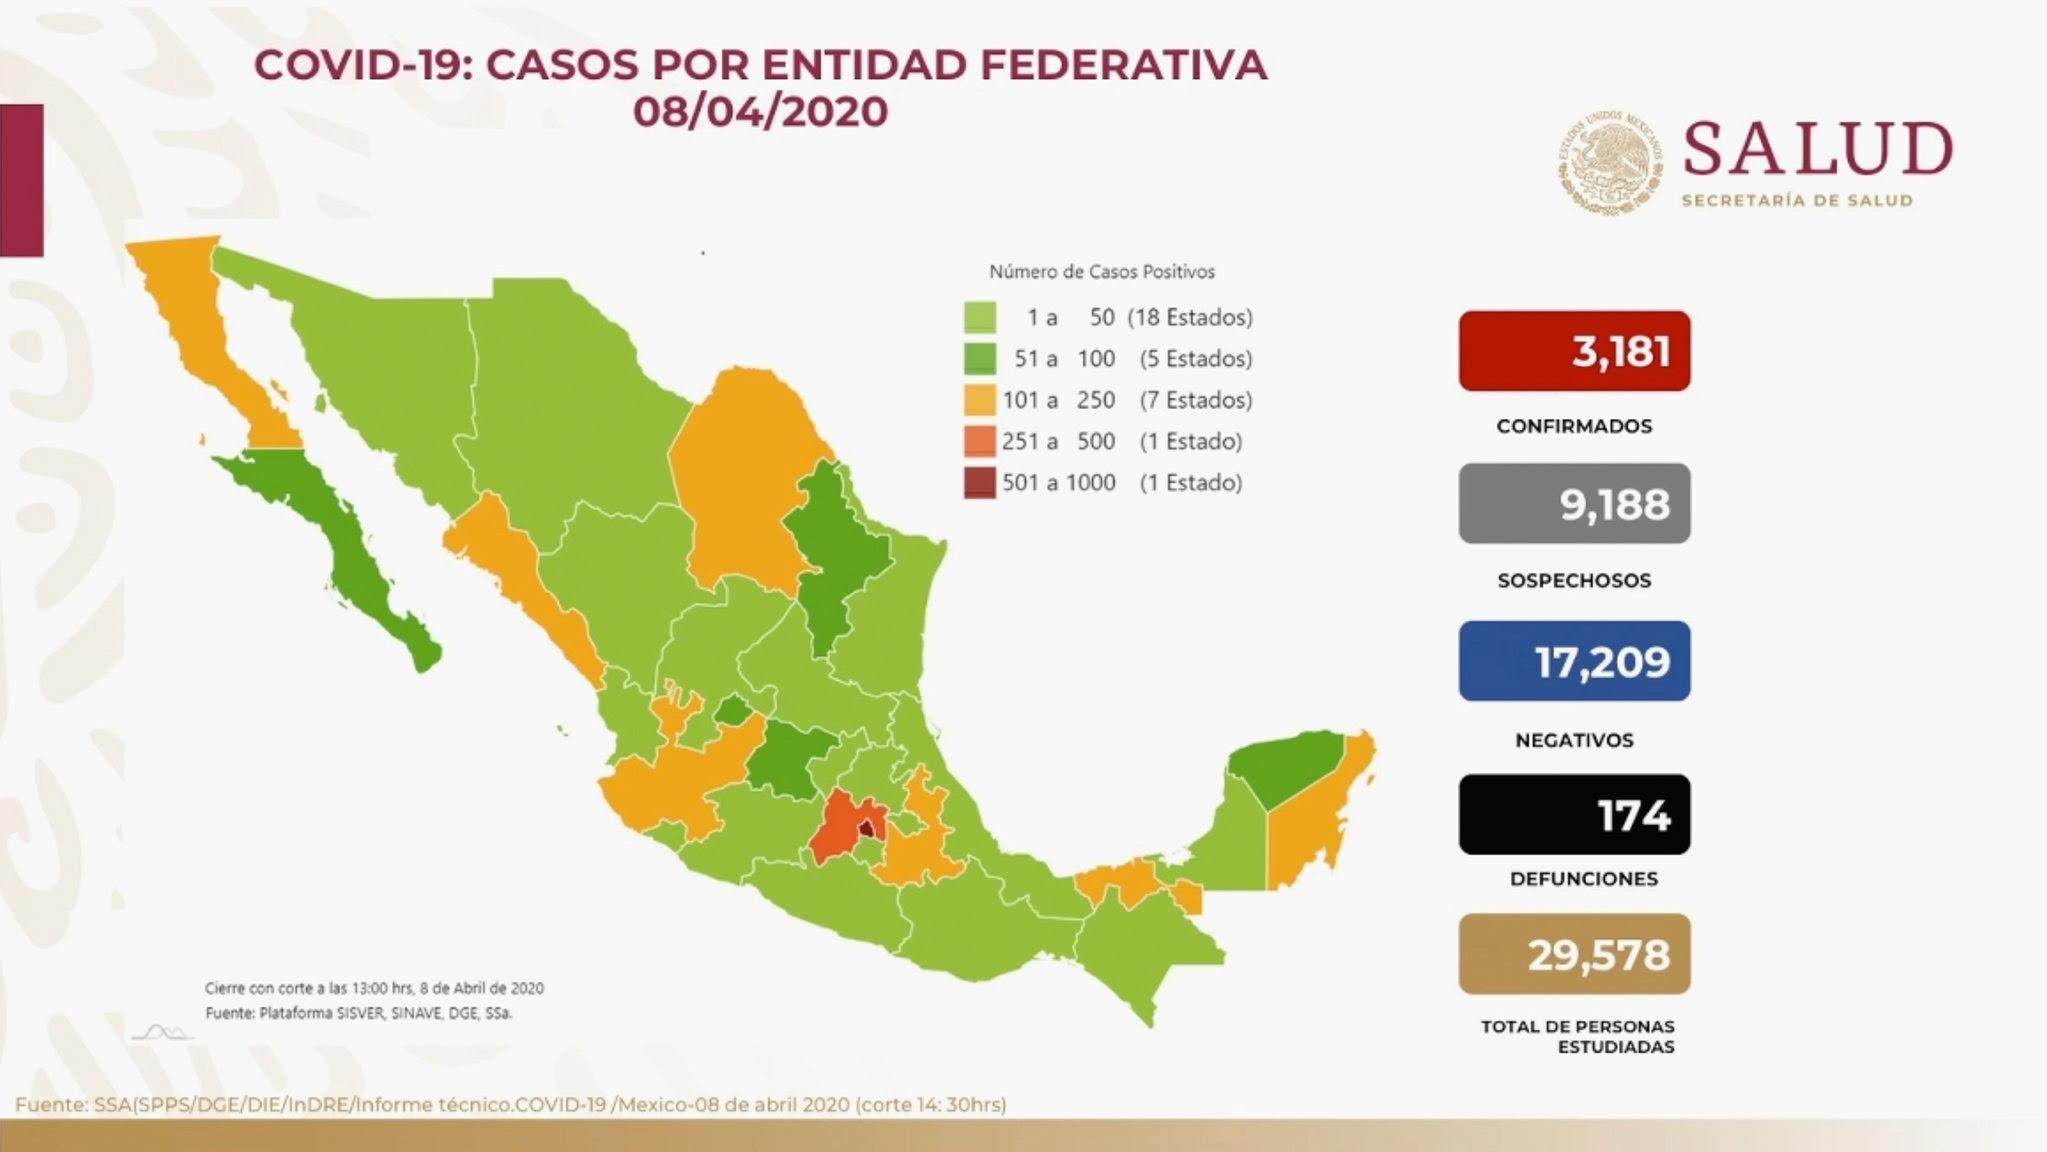 México registra 174 muertes por COVID-19: SSA